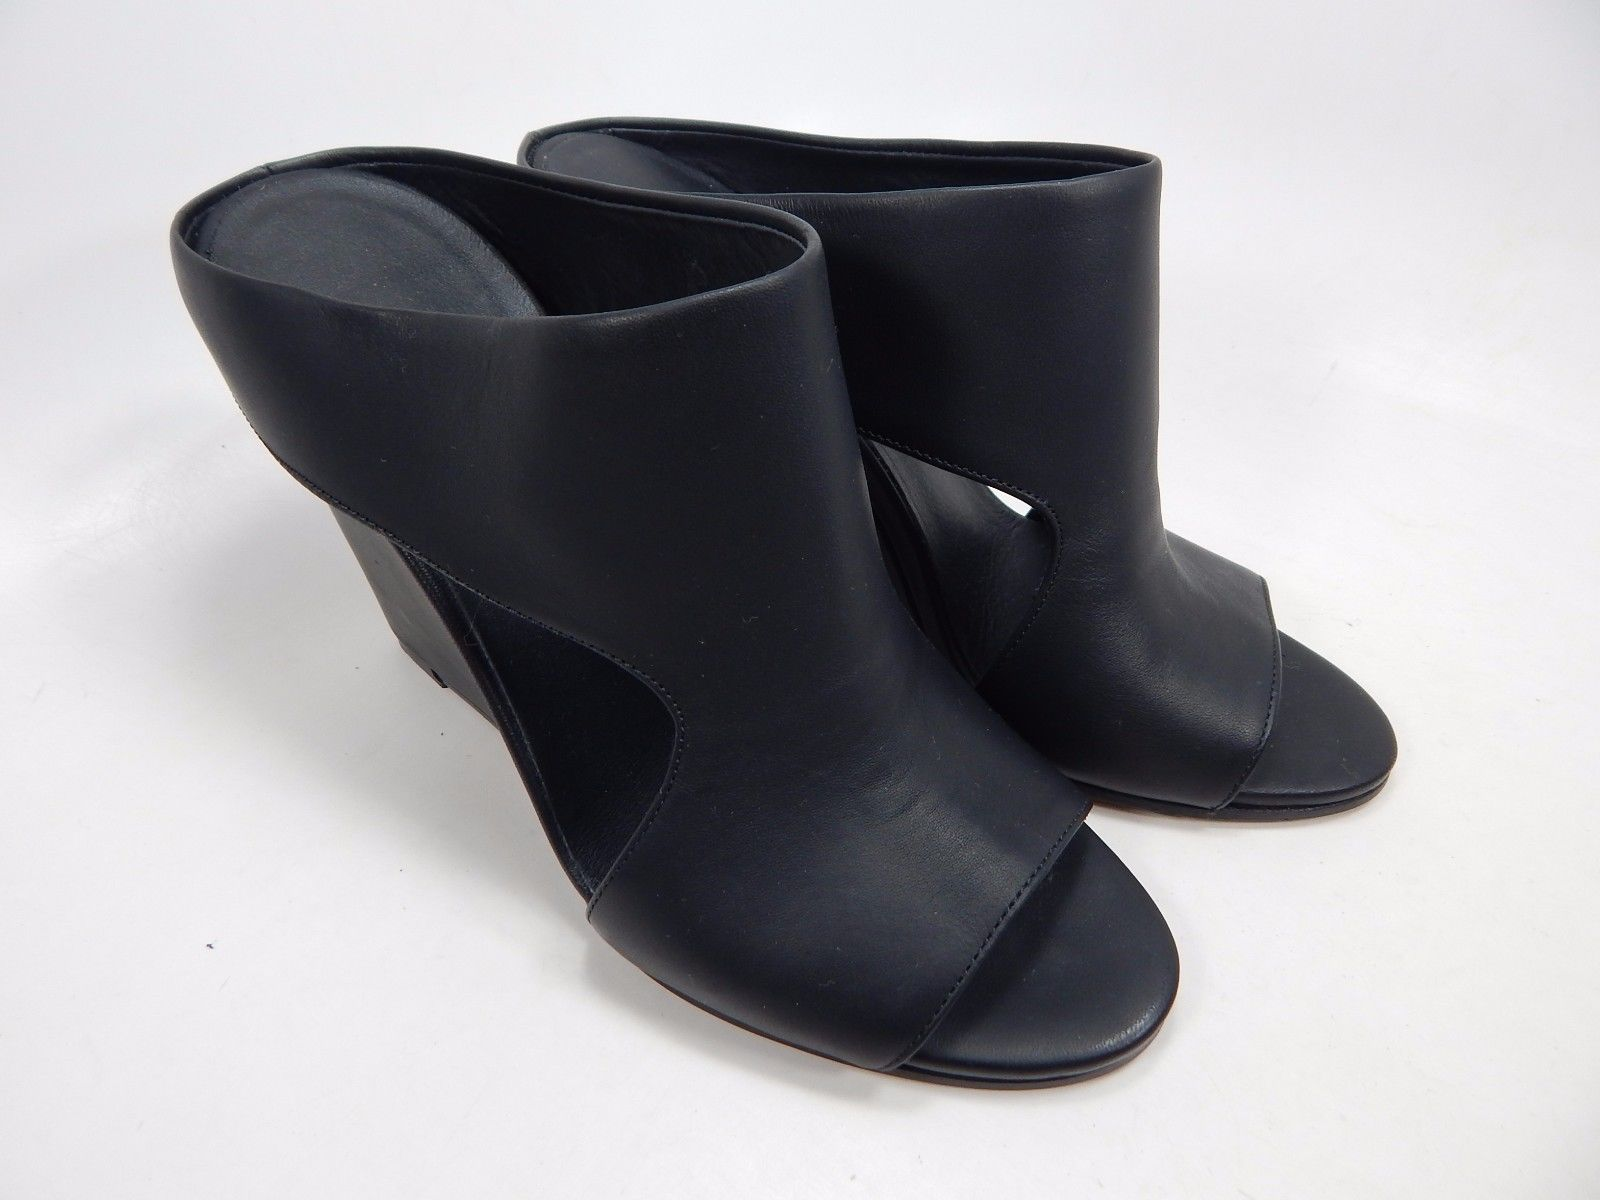 Vince Kaya Open Toe Wedge High Heel Mule Women's Size US 5.5 Black $395